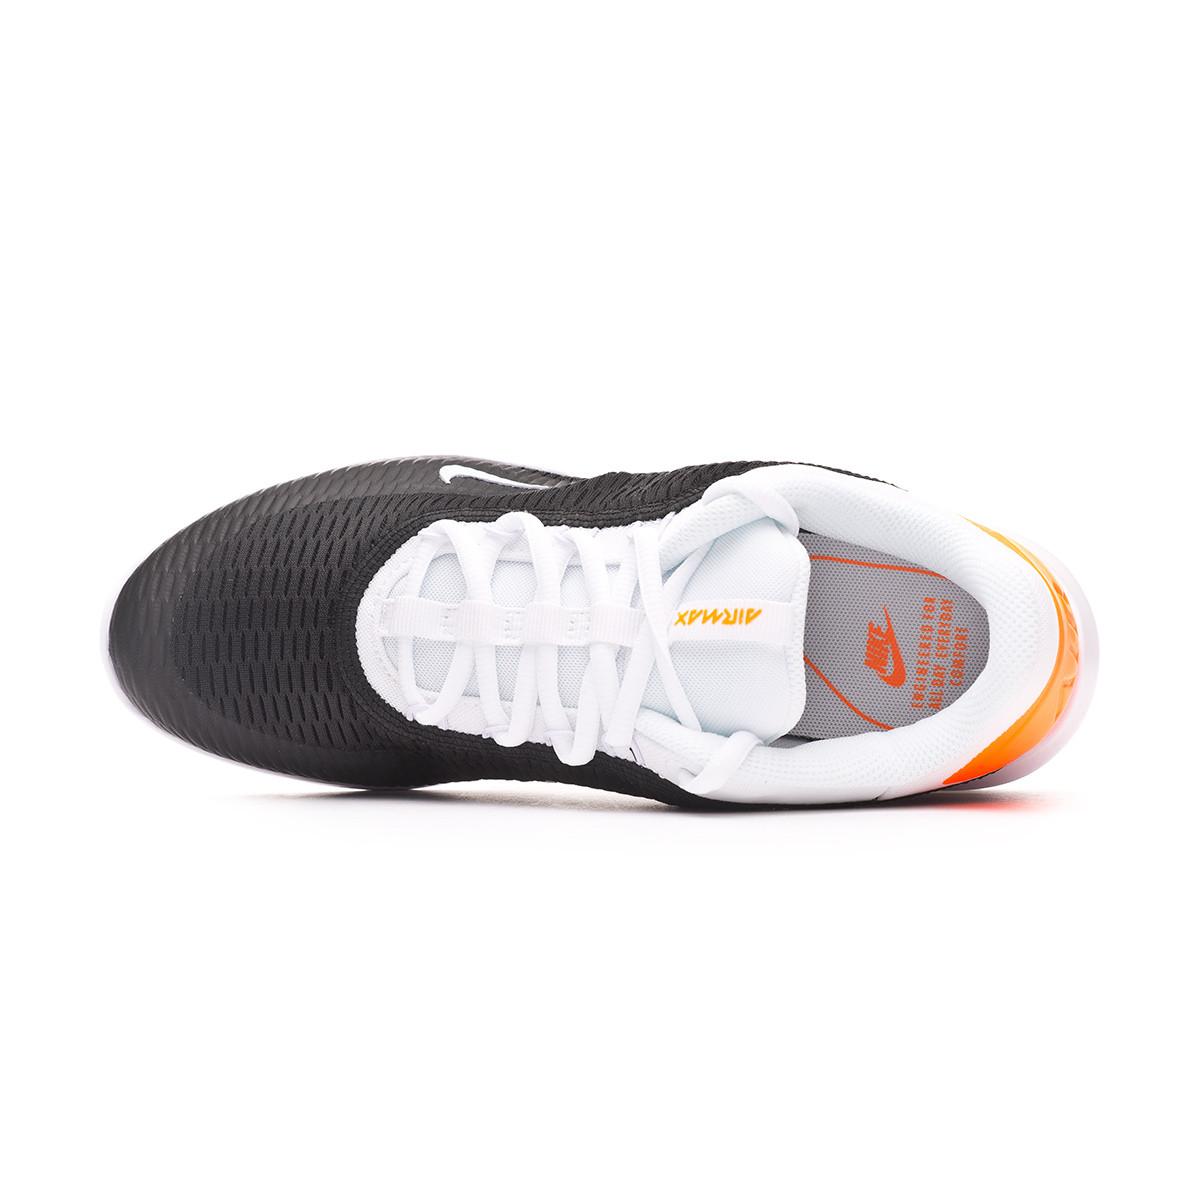 Zapatilla Nike Air Max Advantage III